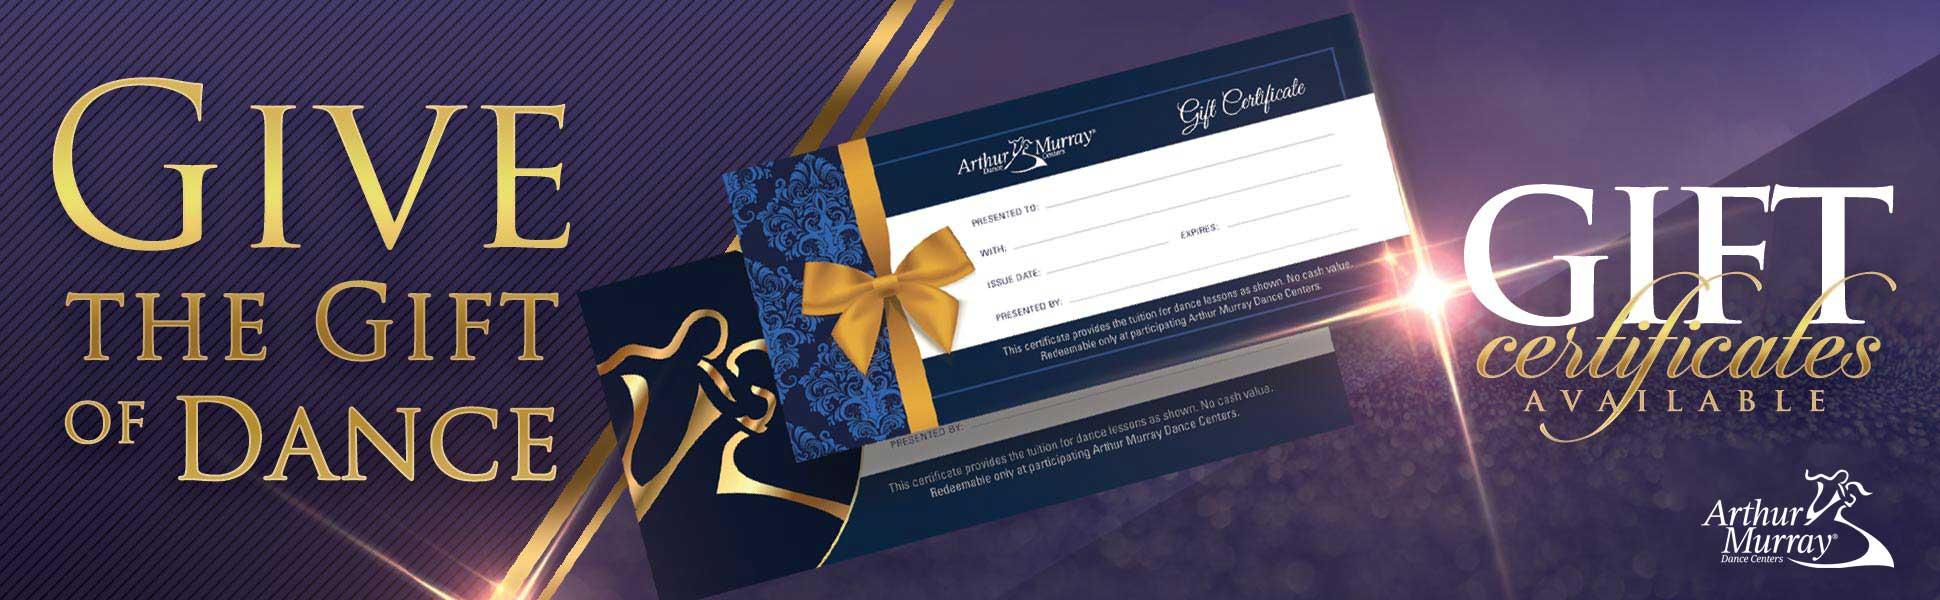 Arthur Murray Dallas Gift Certificates